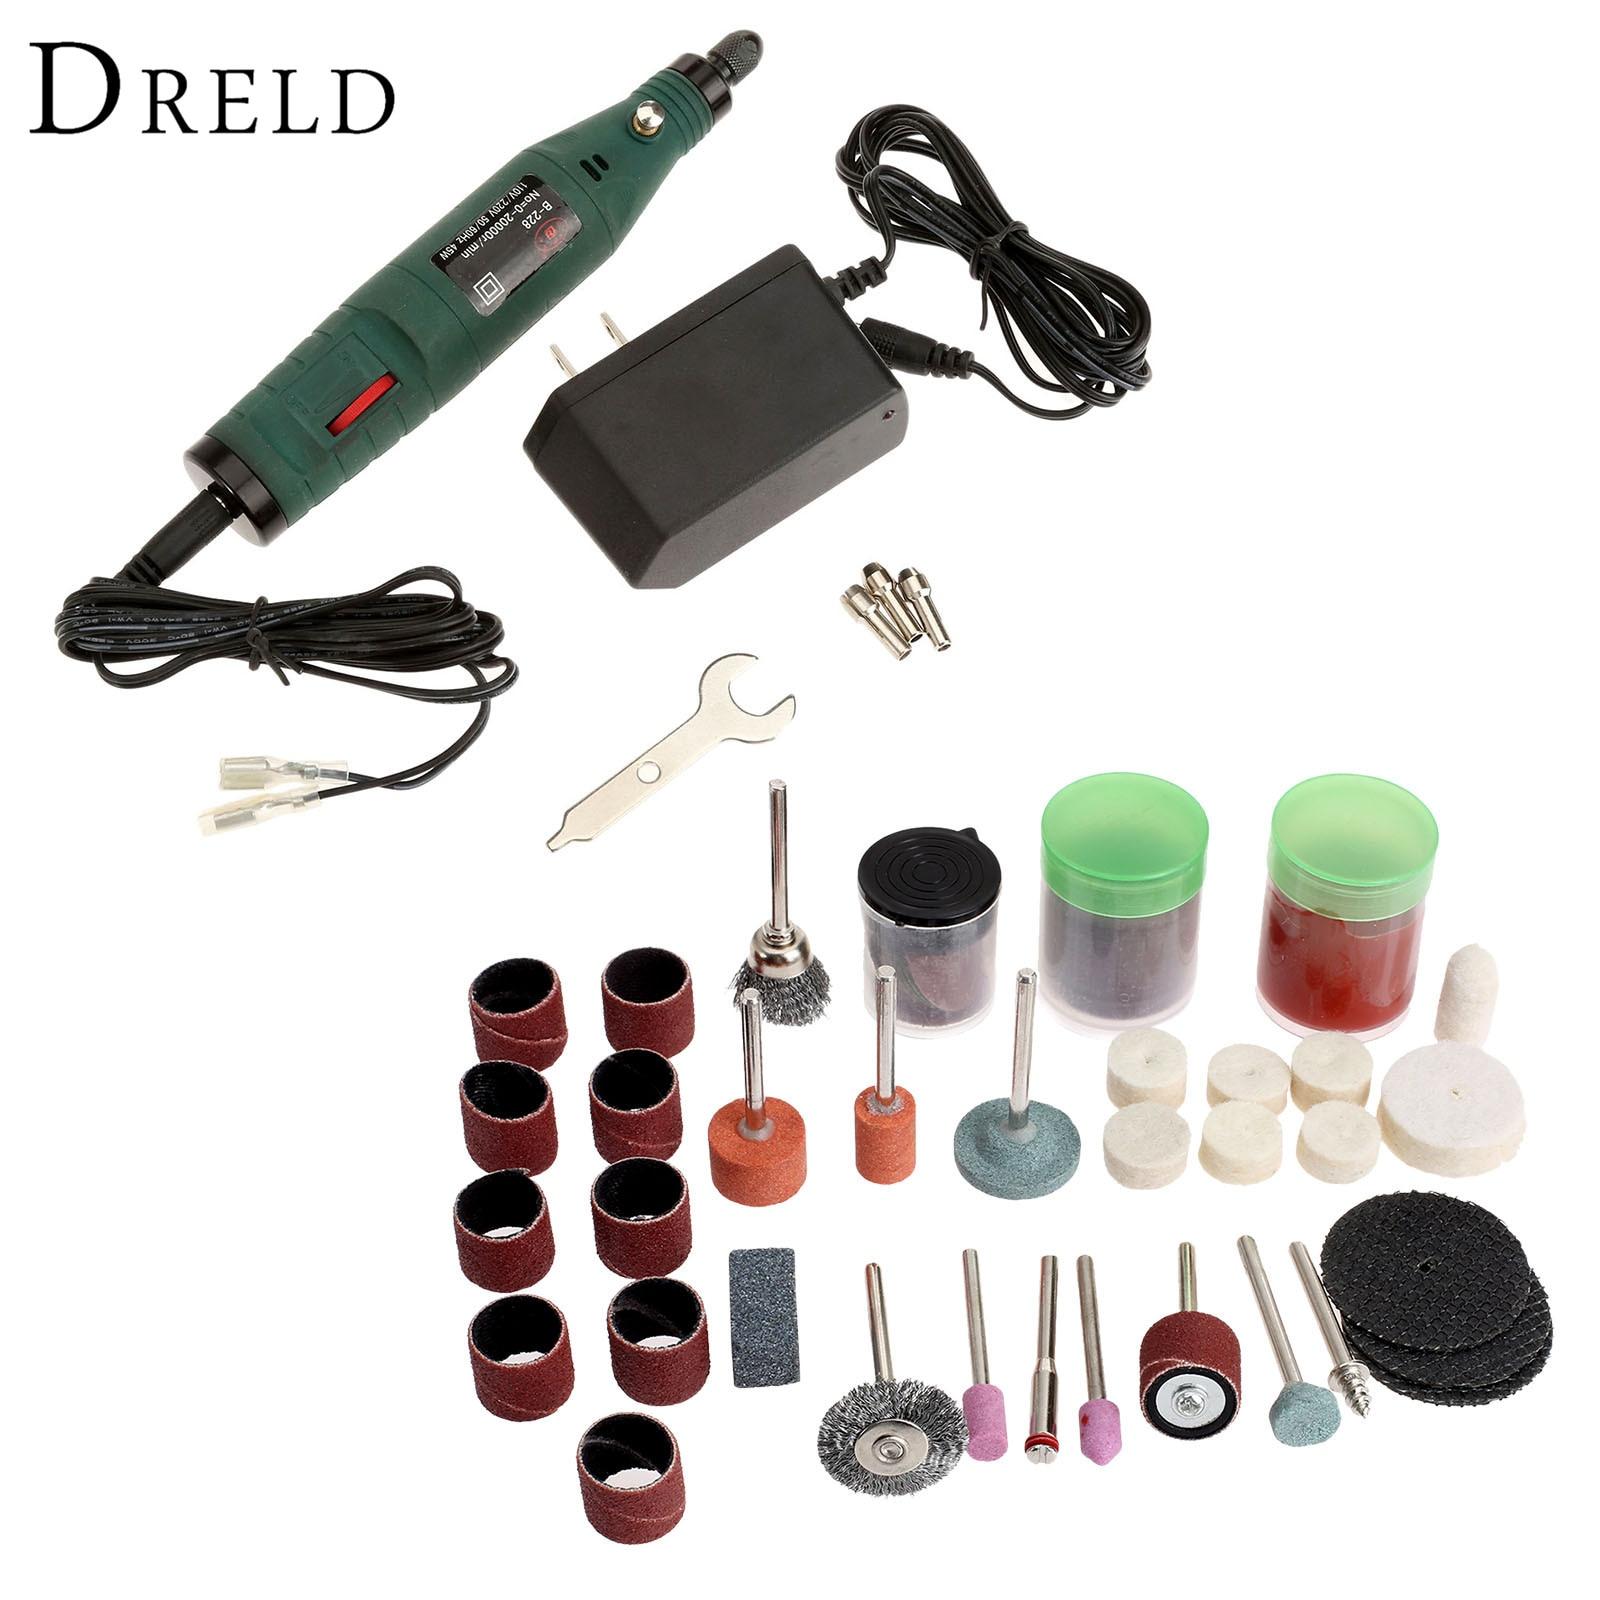 ФОТО DRELD 45W Mini Grinding Machine Electric Drill Die Grinder Electric Tool+105Pcs Grinding Polishing Sanding Tools for Rotary Tool